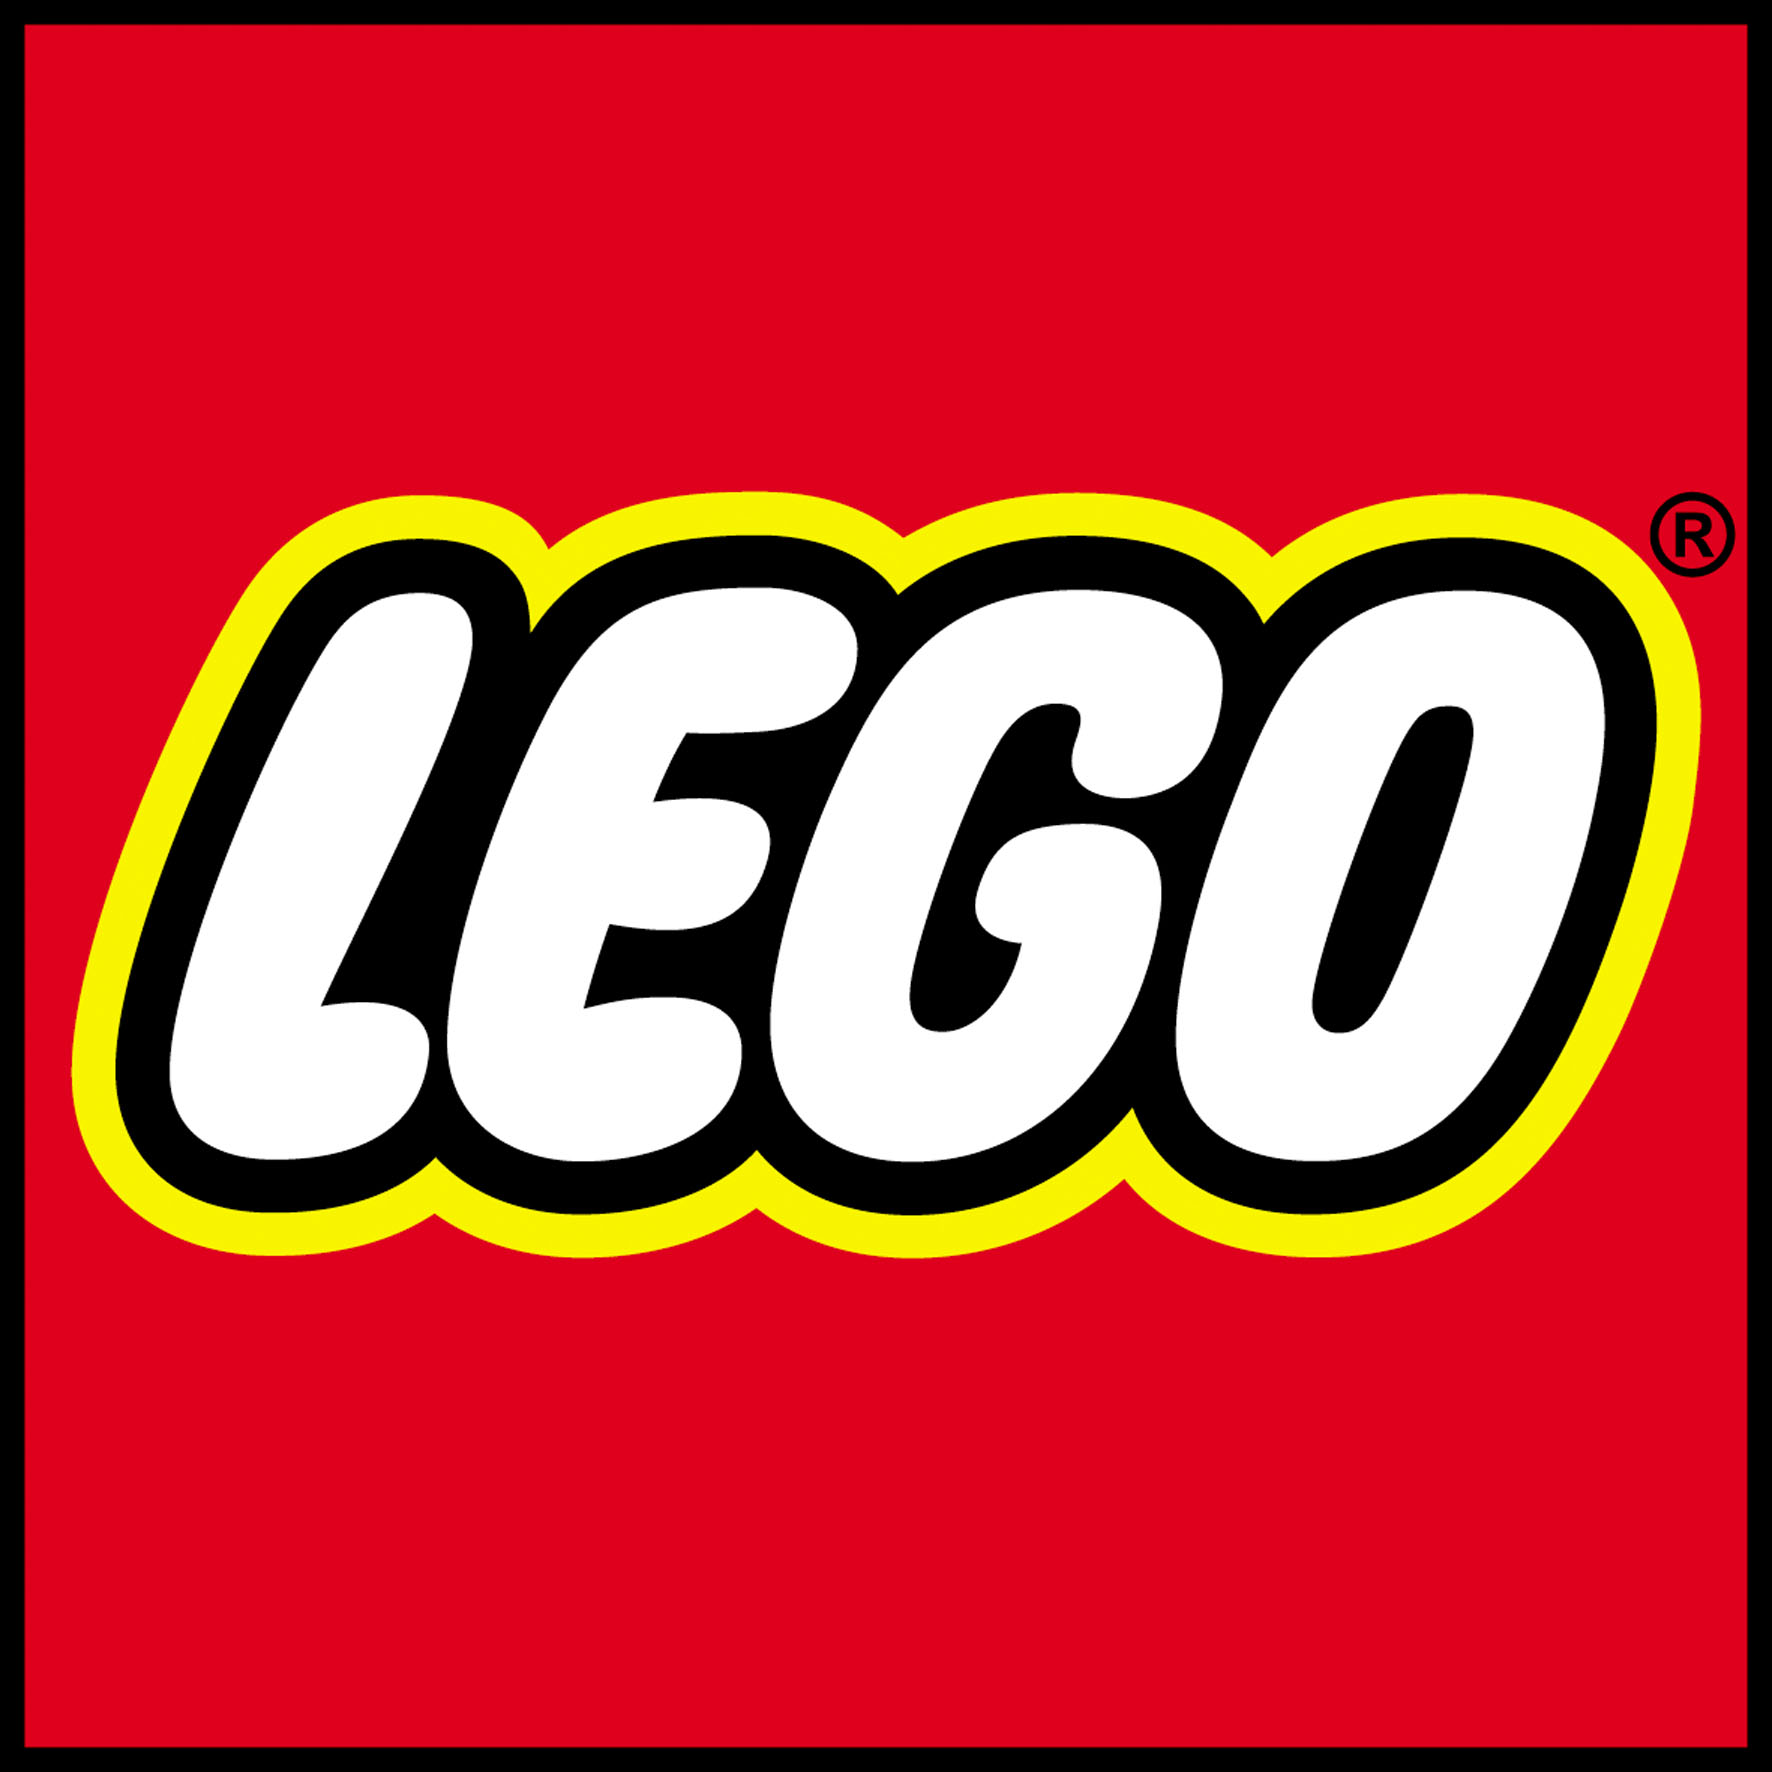 853148 Aimant avec logo LEGO classique  Wiki LEGO  Wikia